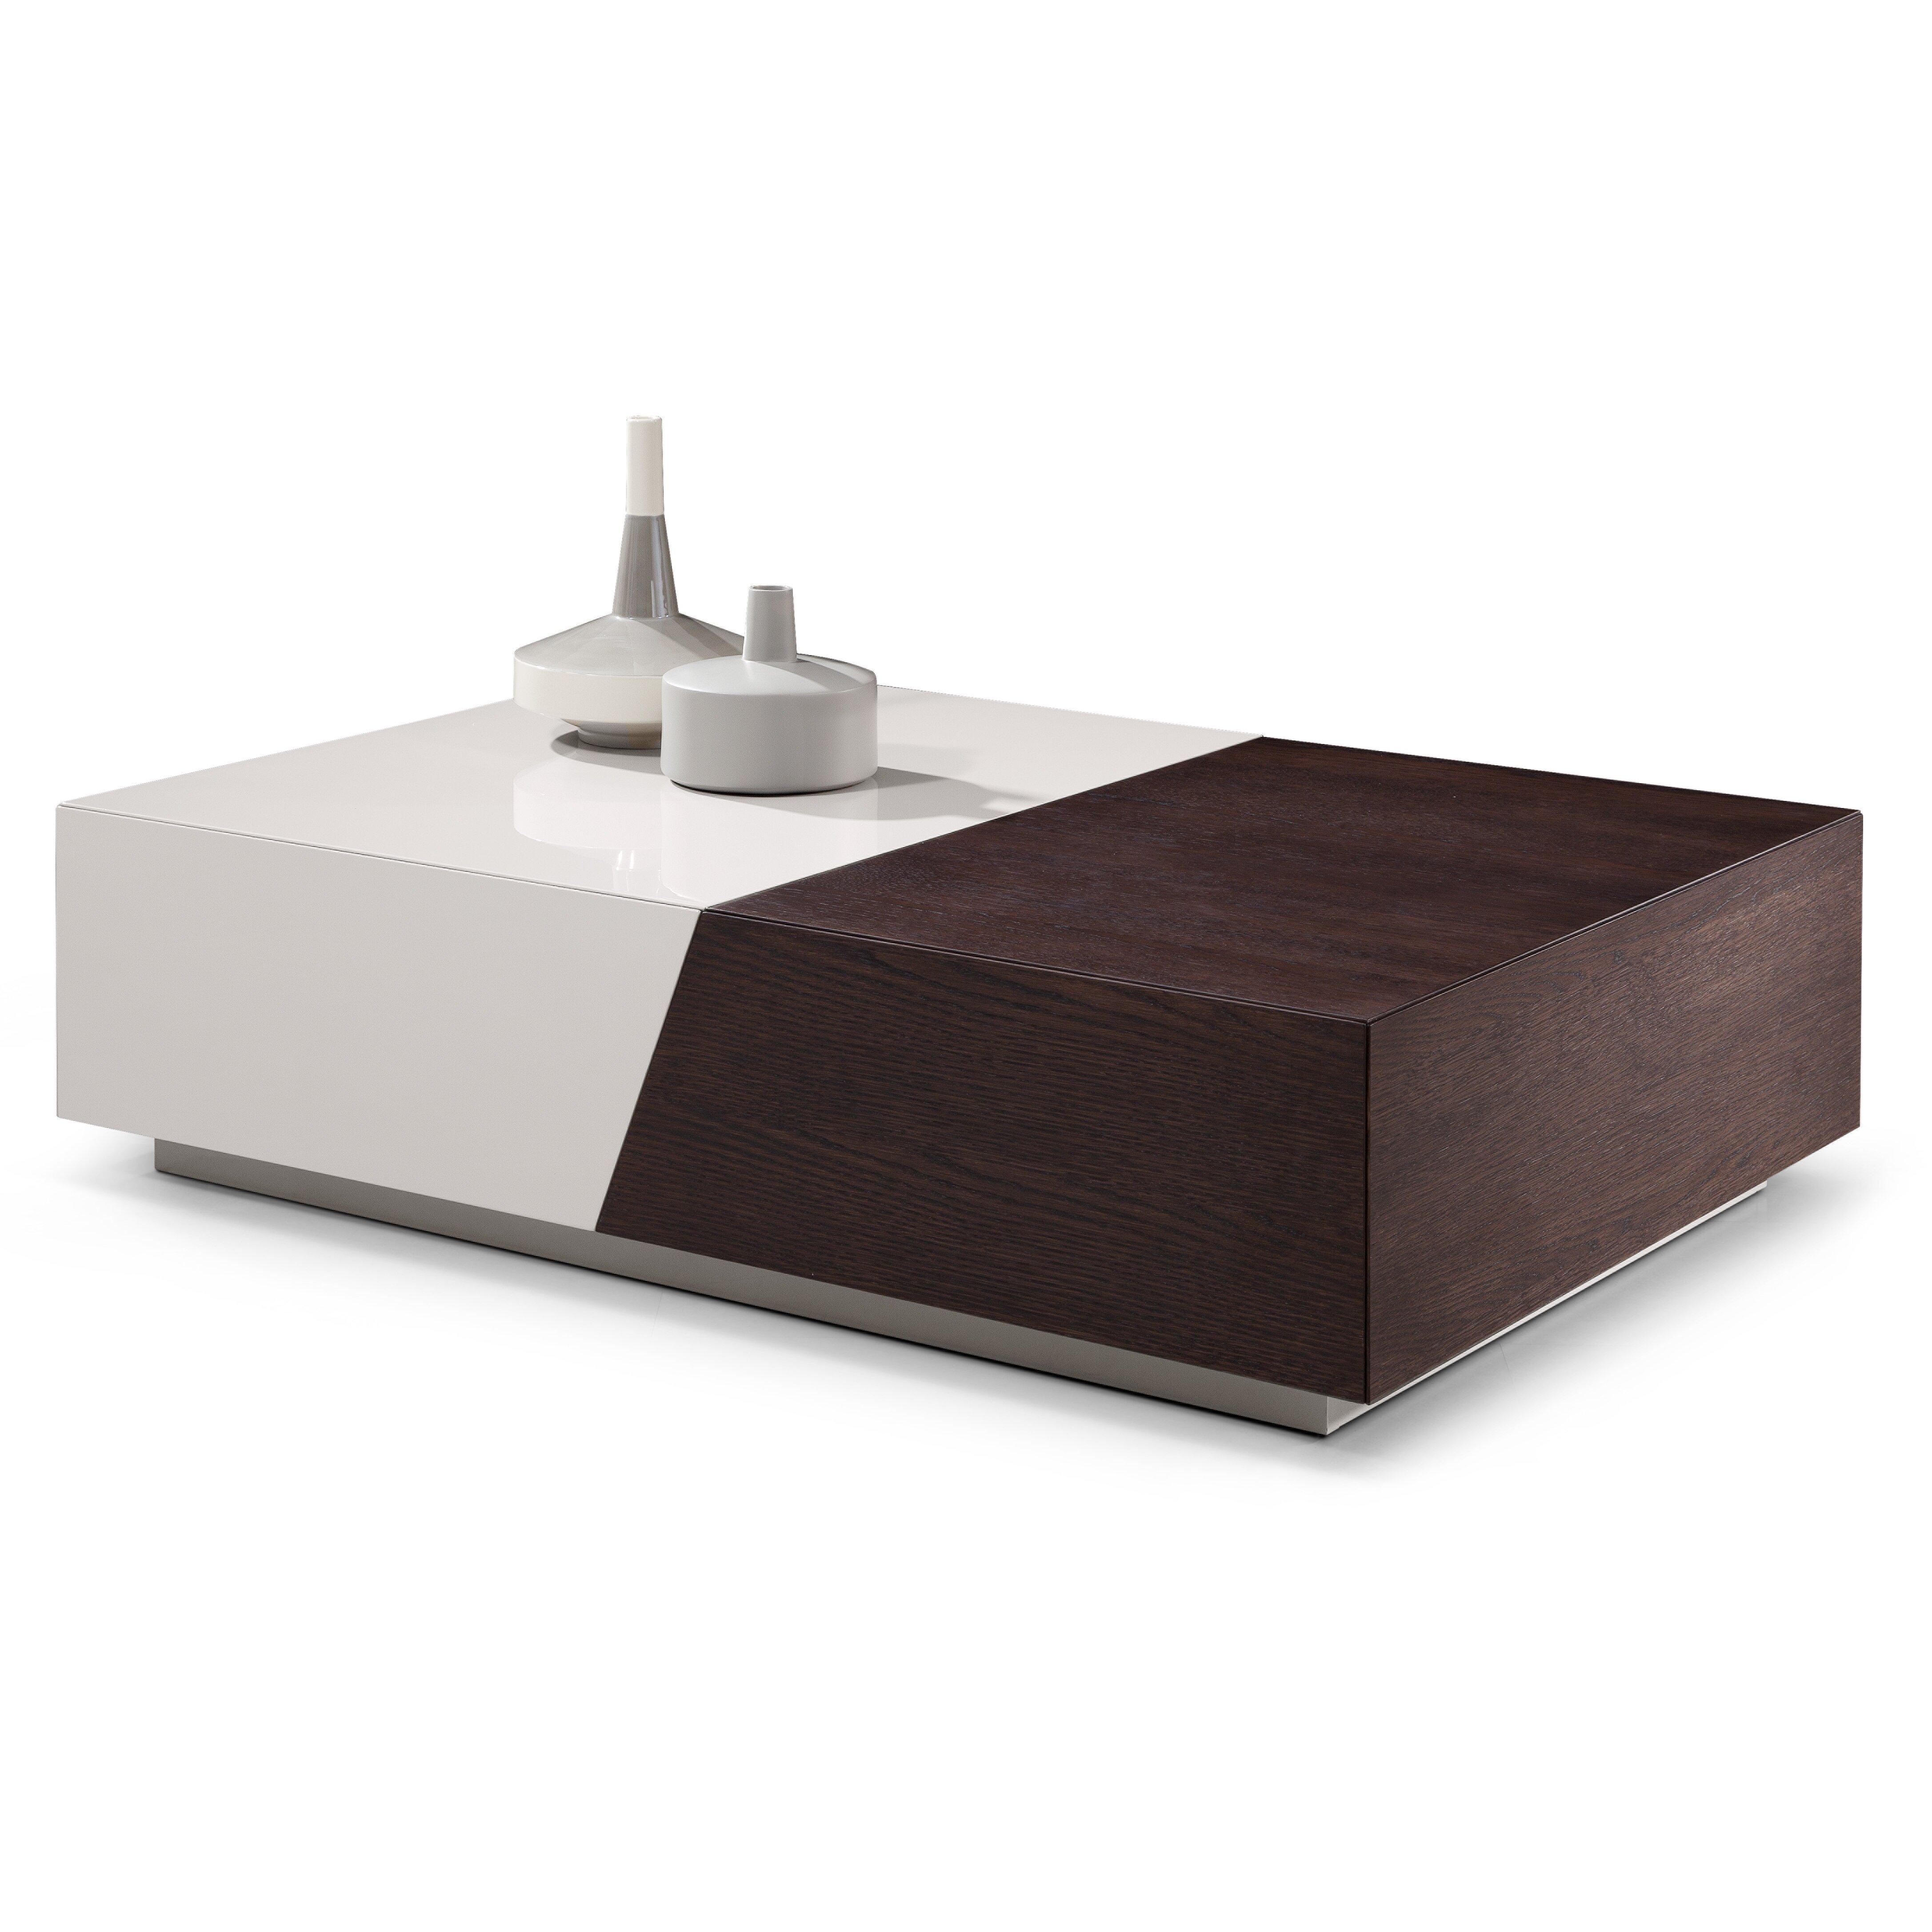 J M Furniture P567a Coffee Table Reviews Wayfair